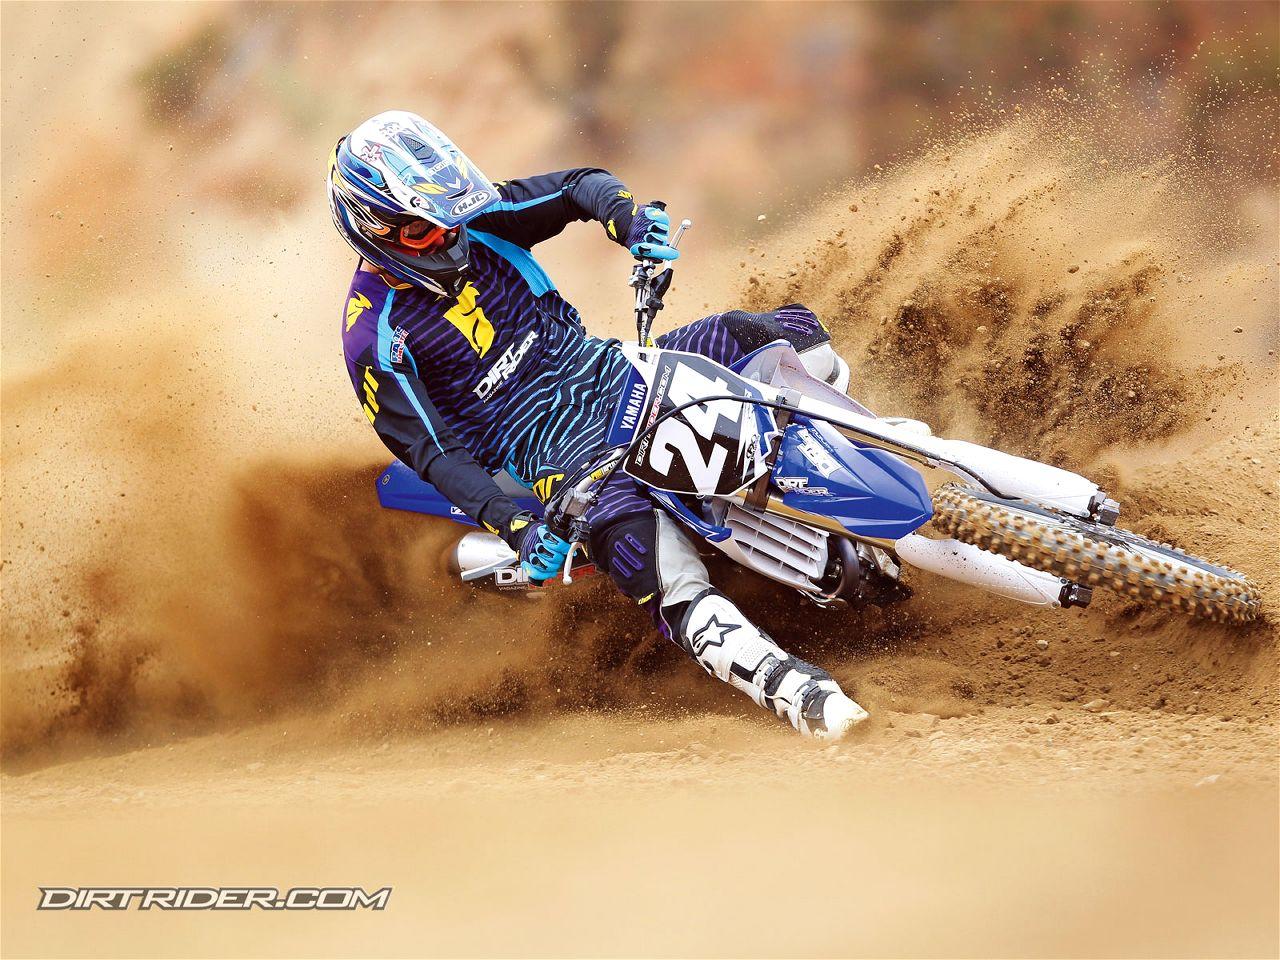 High Resolution Motocross Yamaha Dirt Bike Wallpaper HD 2 Motorcycle 1280x960